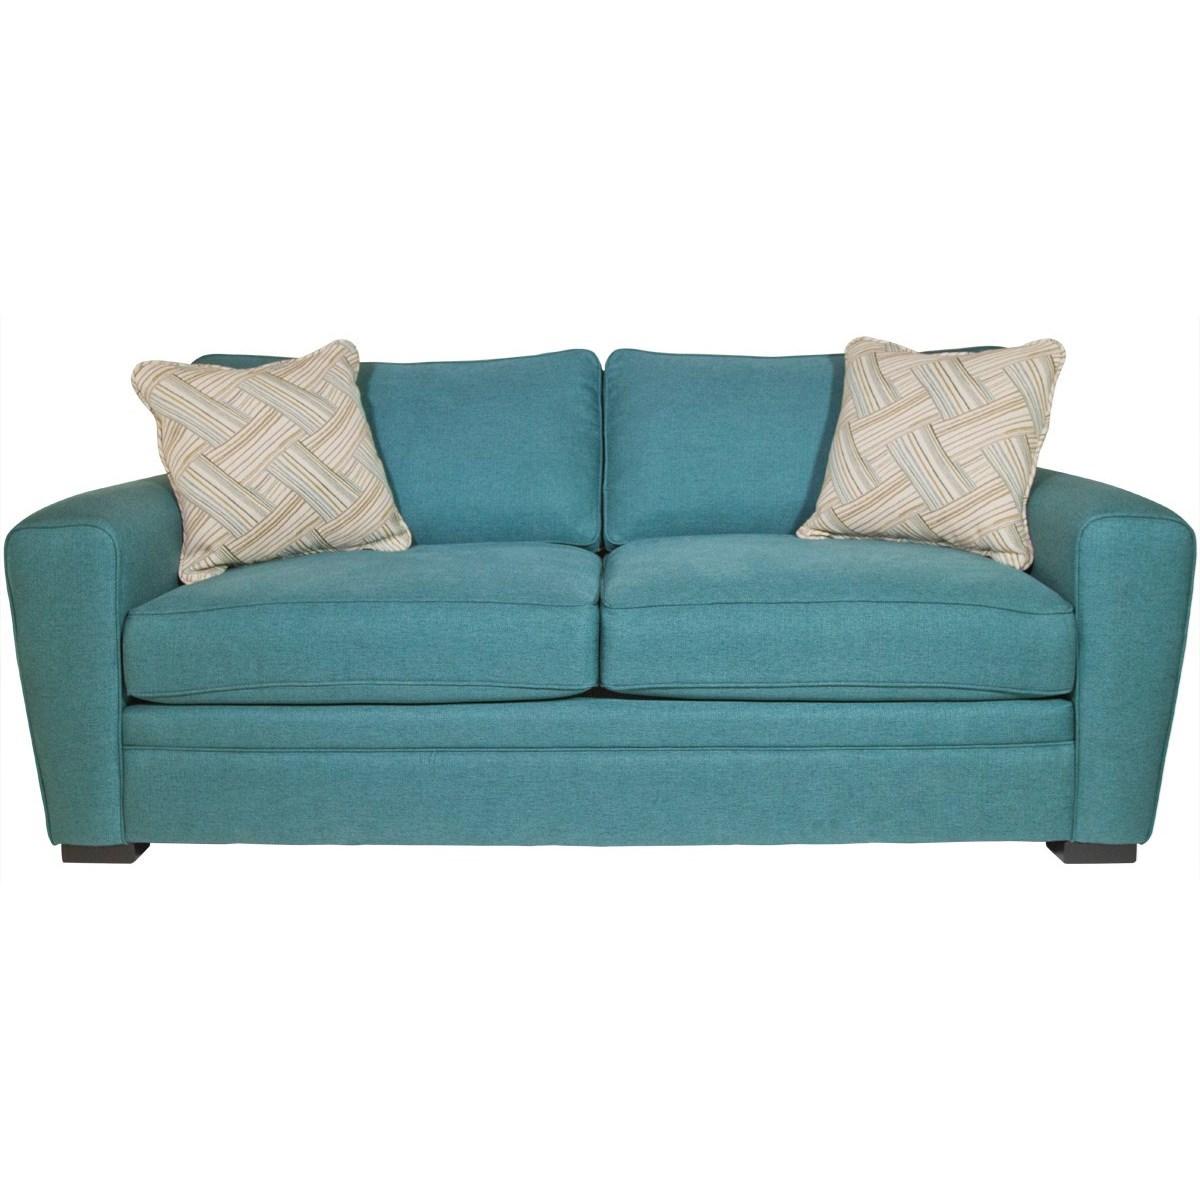 Delightful Jonathan Louis Choices   ArtemisFull Sofa Sleeper ...